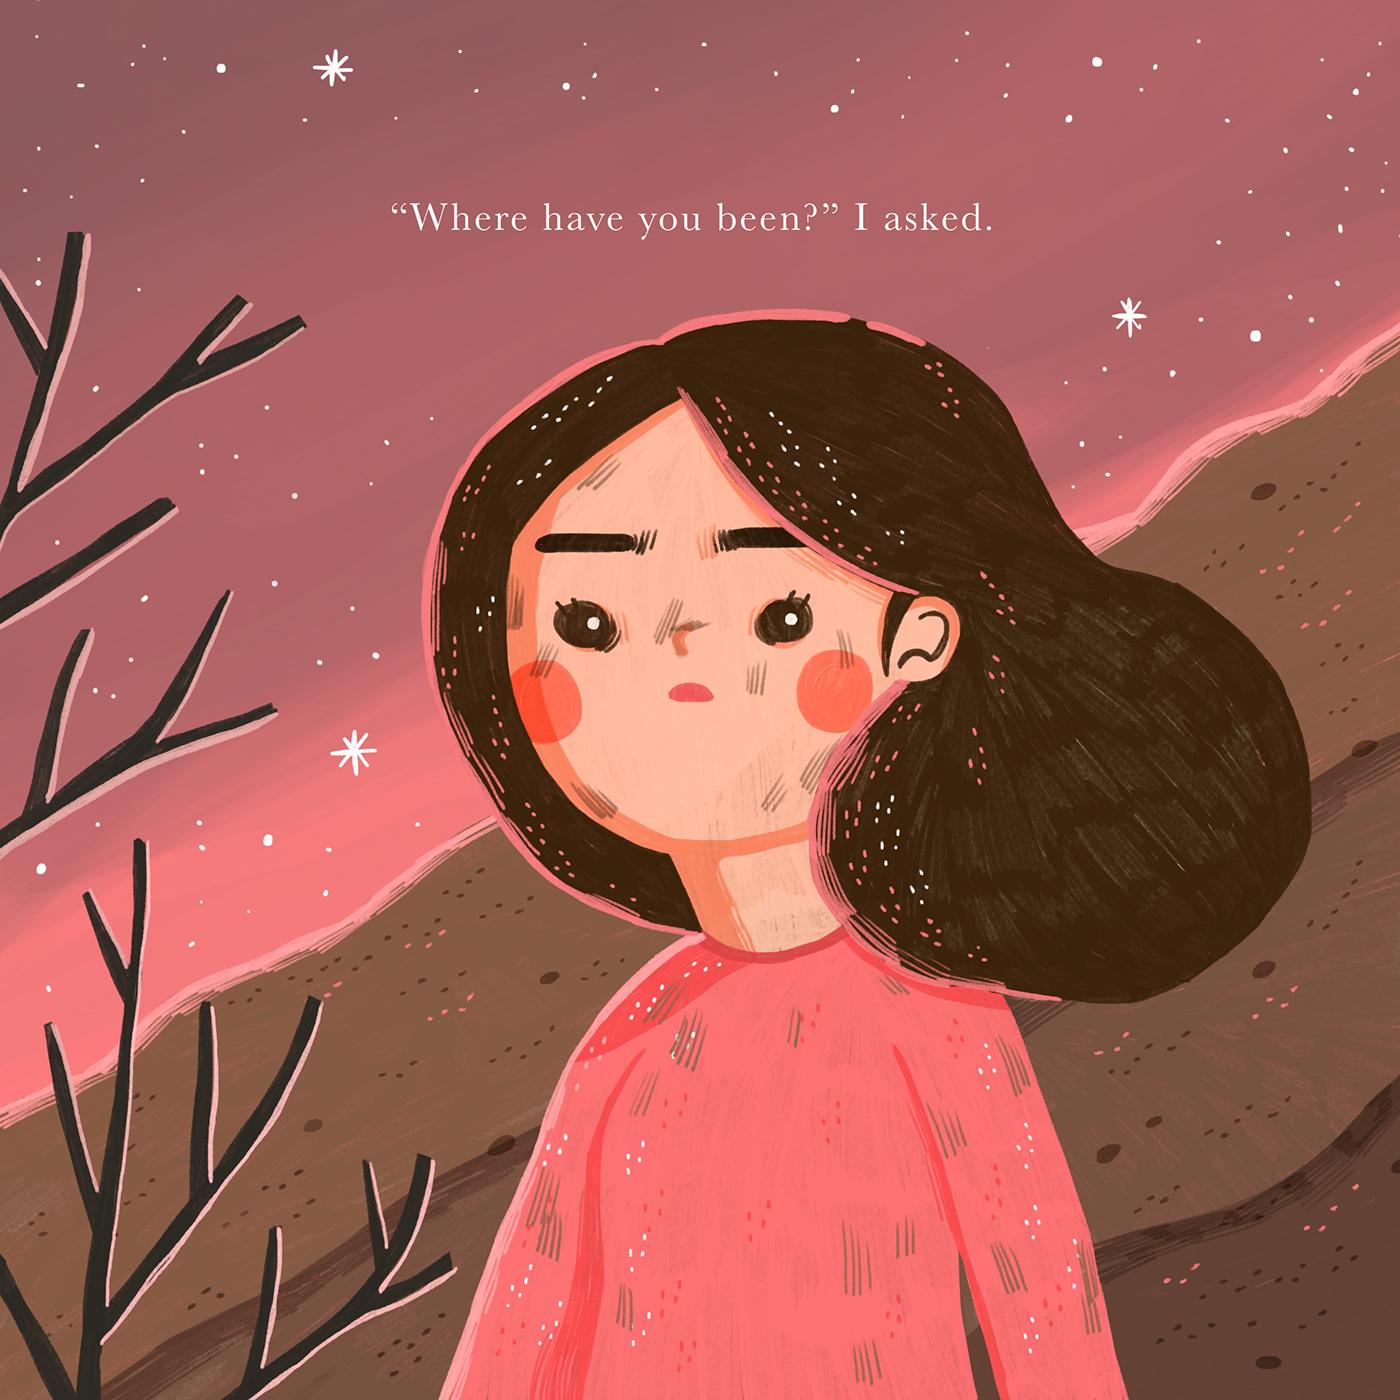 Easter illustrated poem whimsical illustration easter story children illustration hope Story Book short story fantasy illustration